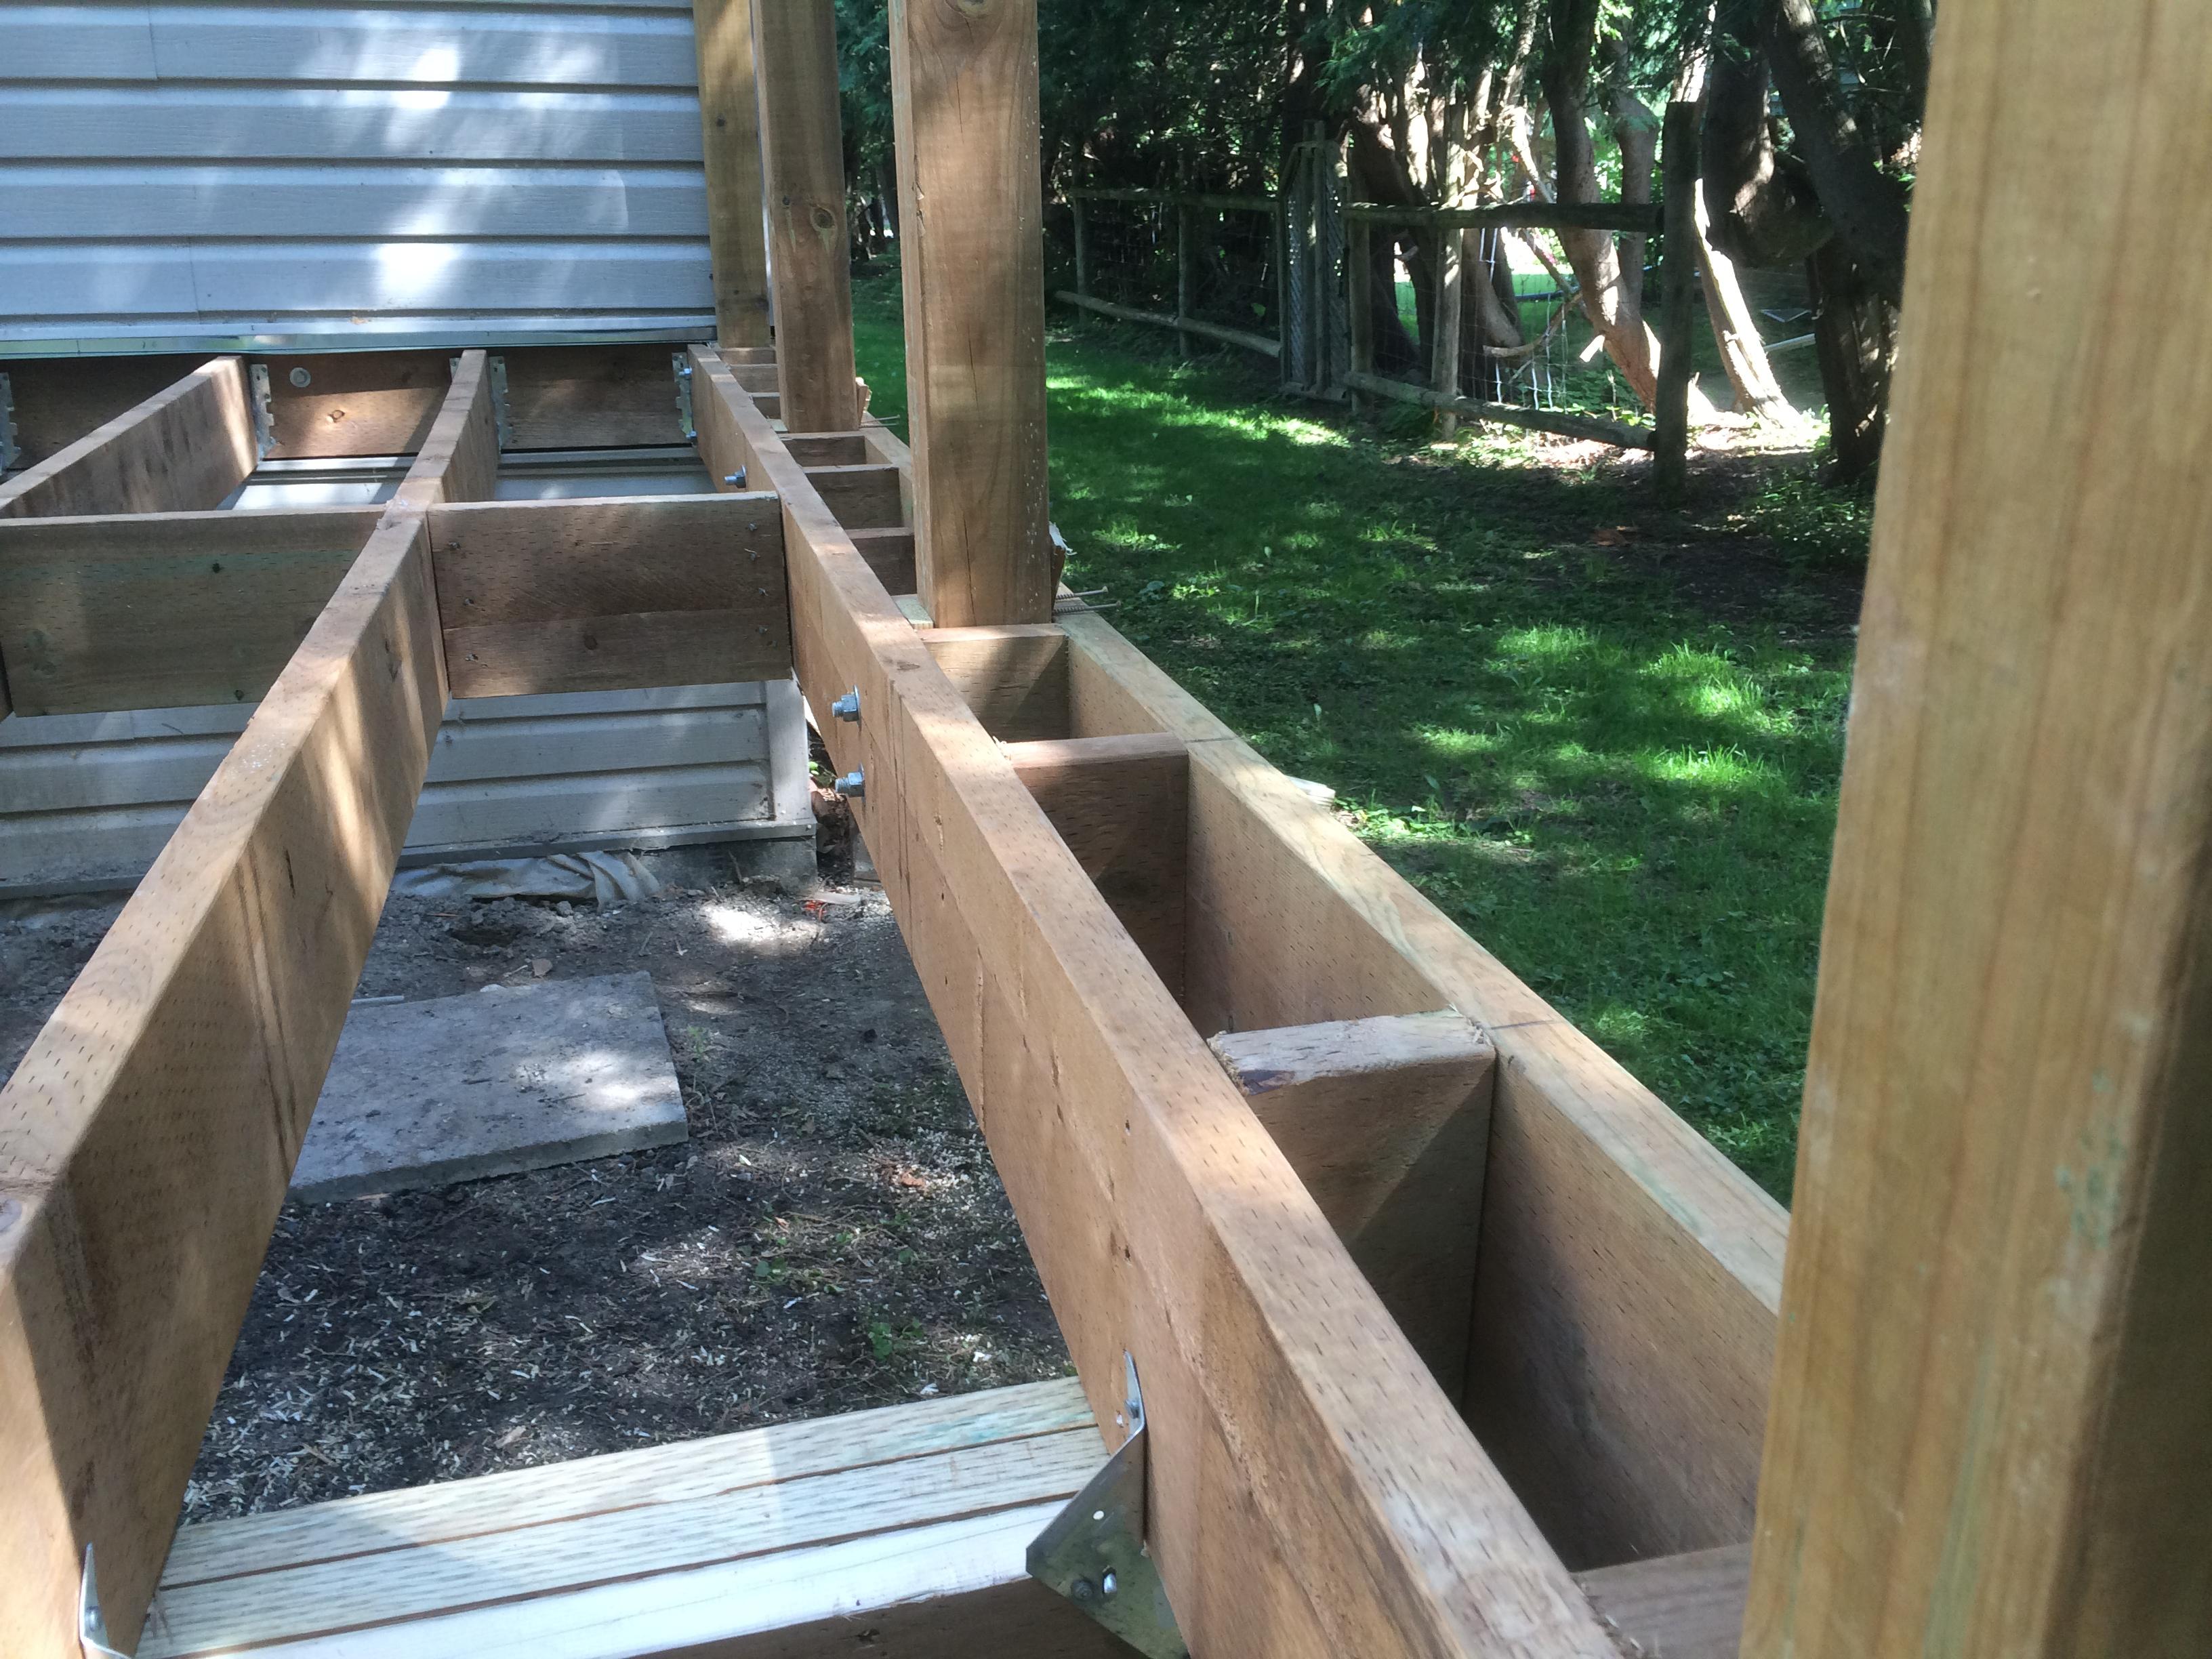 Picture Framing Deck Boards ~ Innisfil deck rebuild during construction framing